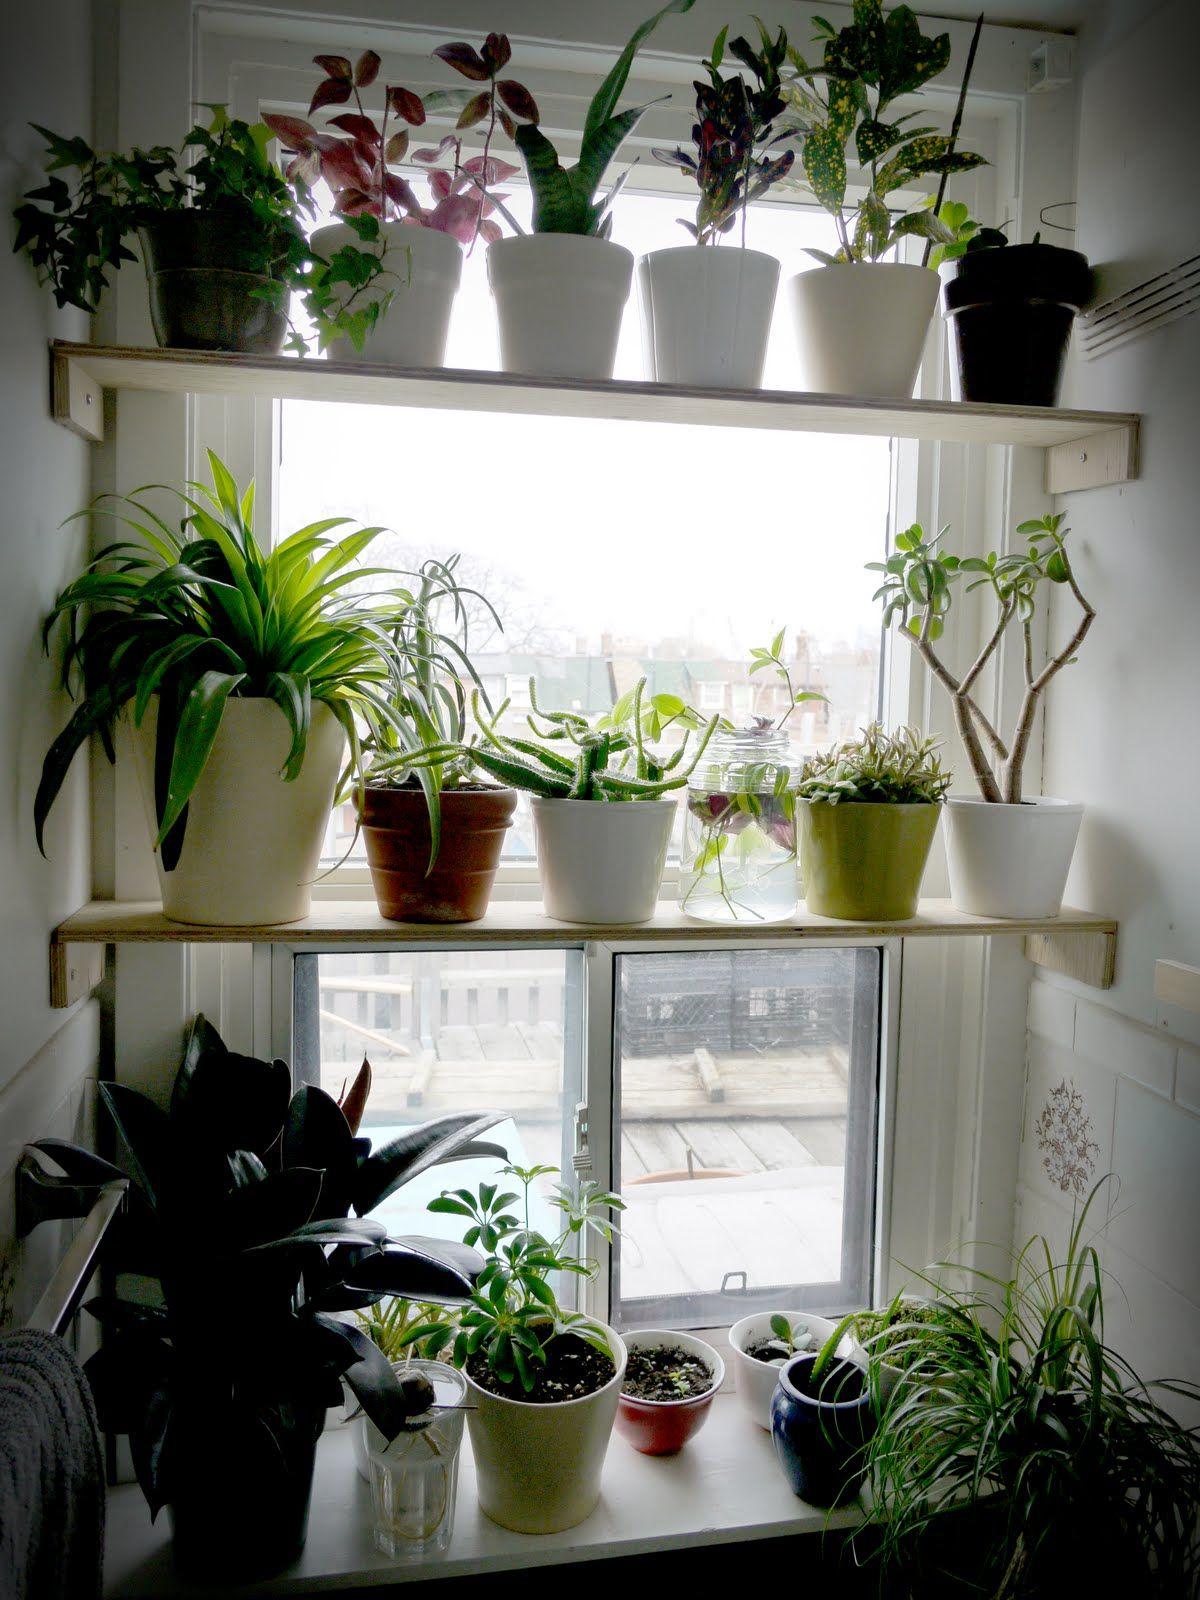 http://2.bp.blogspot.com/-dQ9D9ViZj6o/Tau4Euoc6TI/AAAAAAAAACs/9PiIYASsFQs/s1600/garden+window.jpg